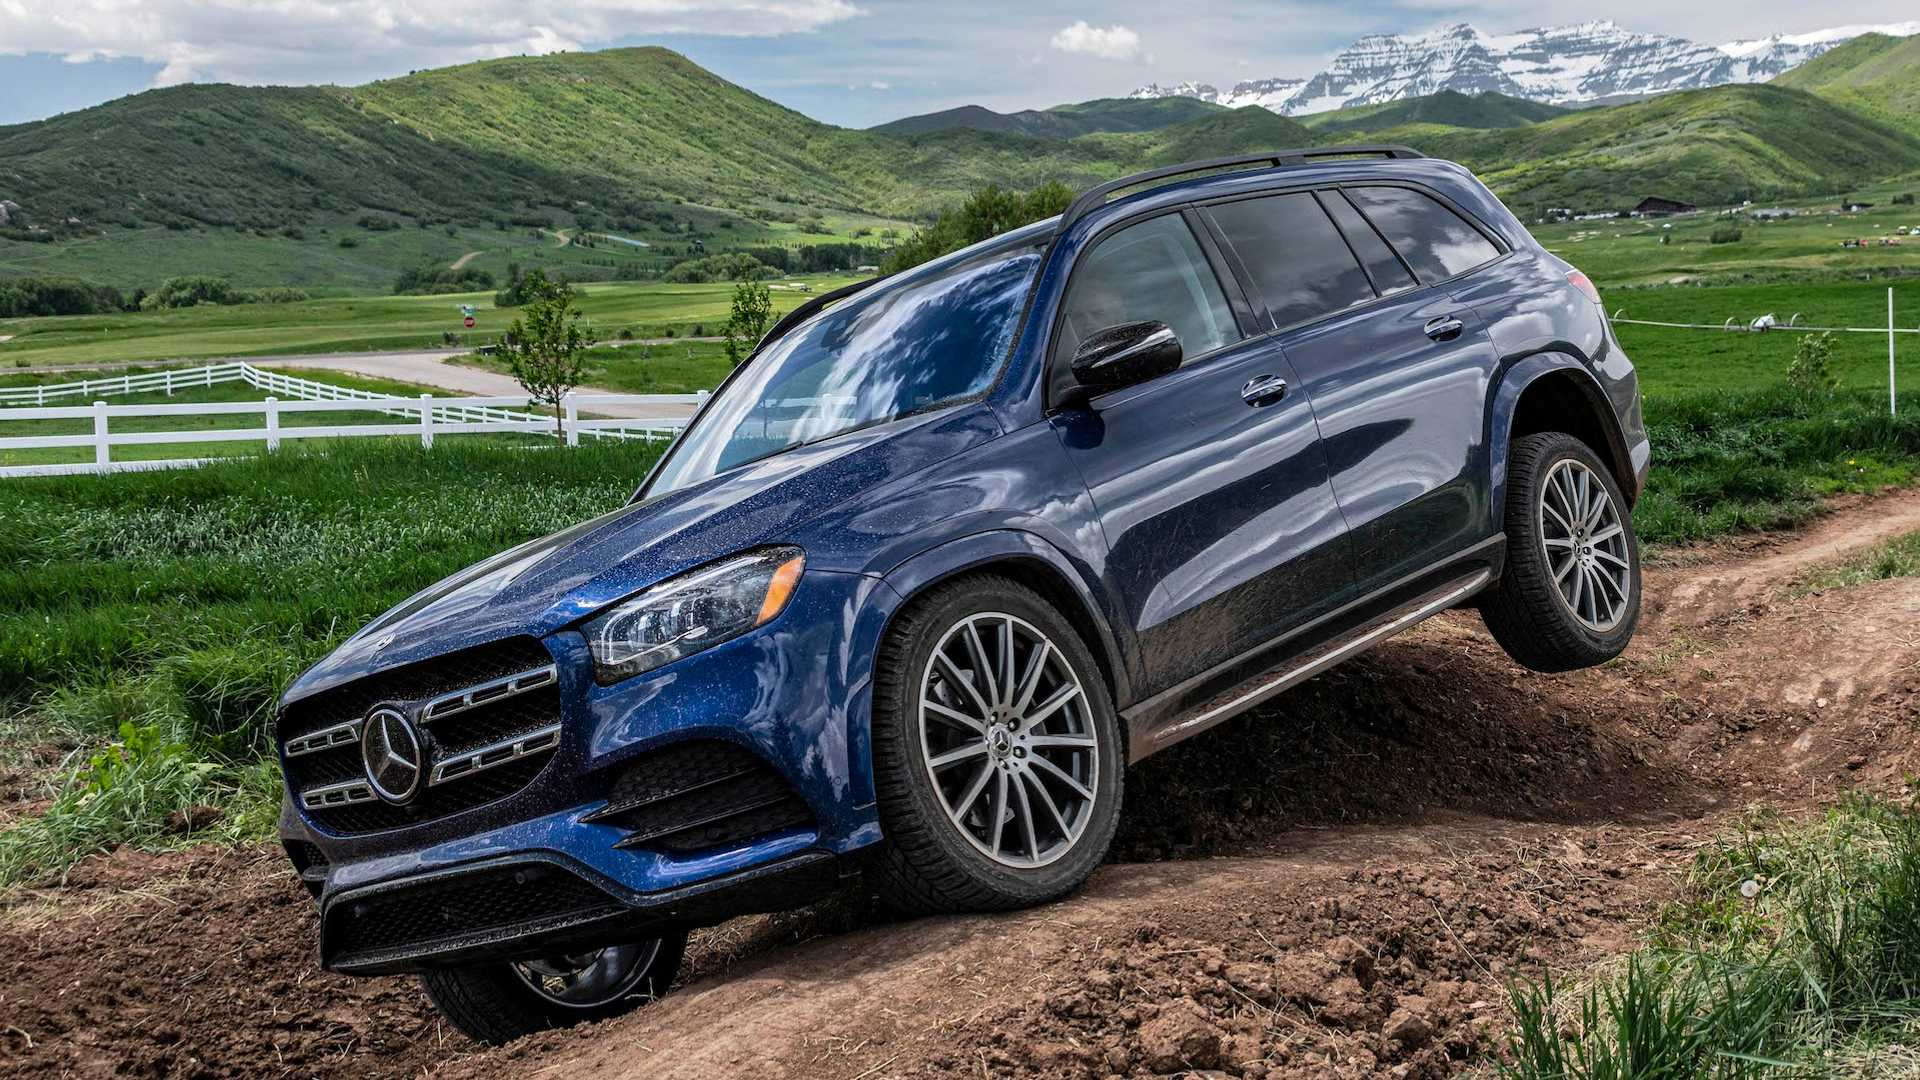 Best Ad Converter 2020 The 2020 Mercedes Benz GLS Is Surprisingly Good Off Road